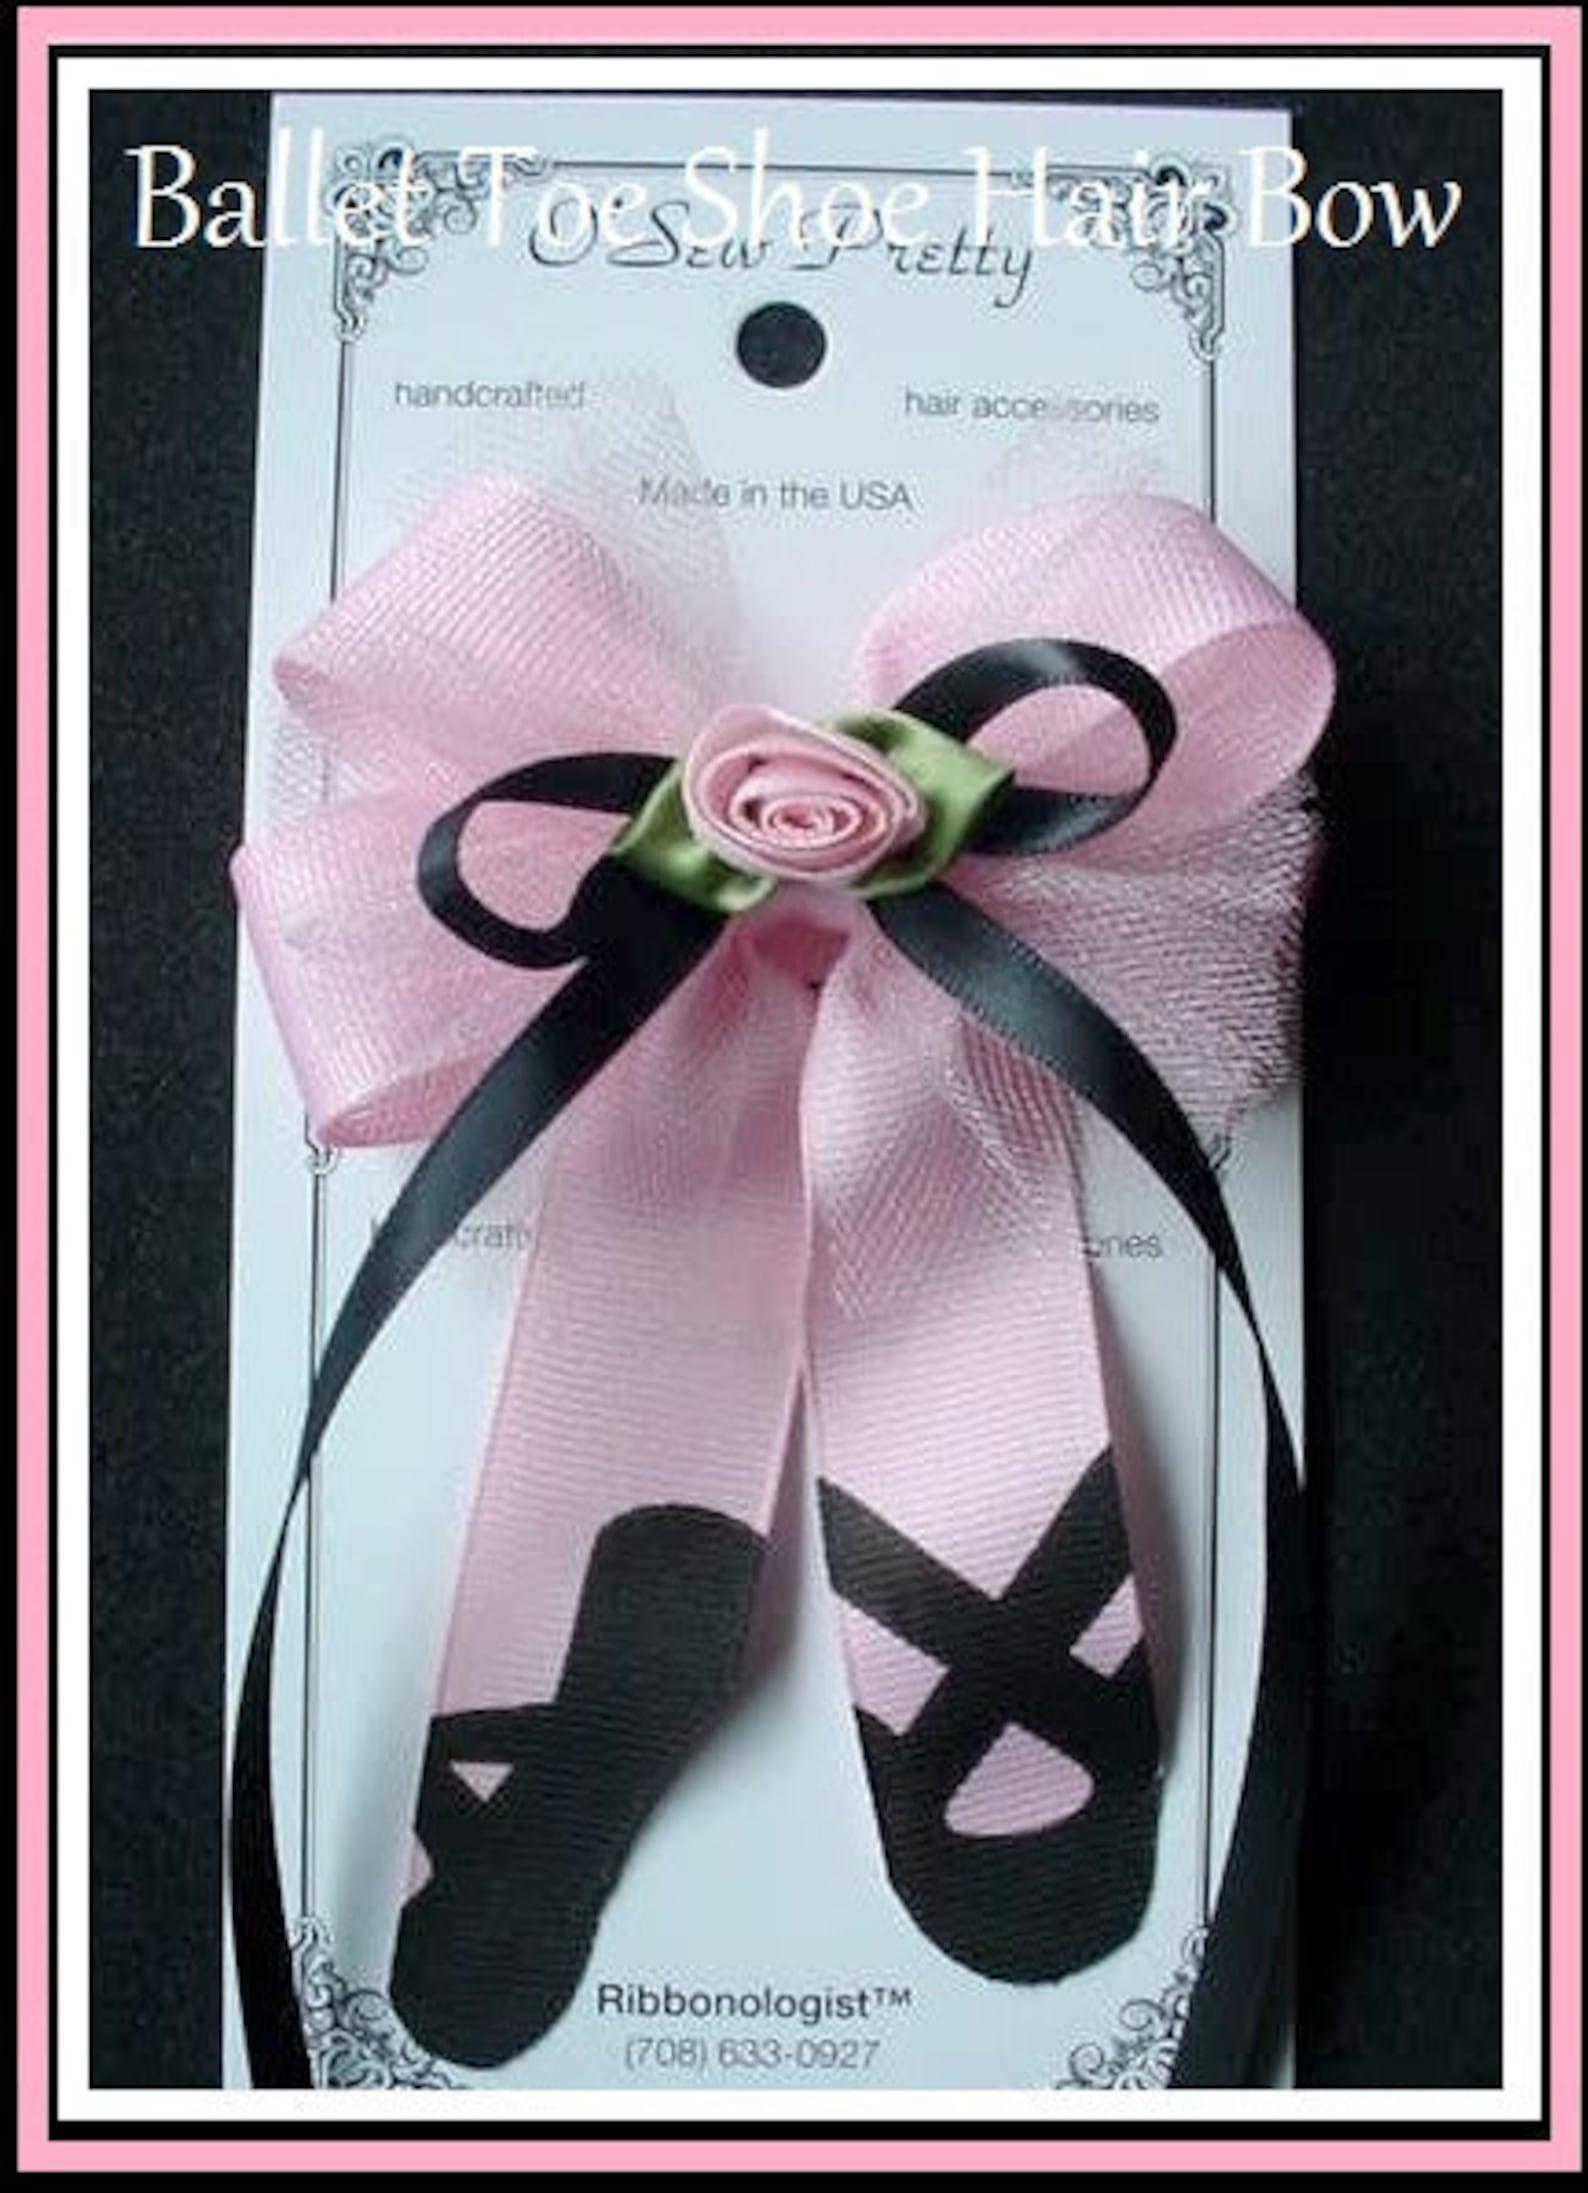 ballerina hair bow, ballet hair bow, ballet toe shoe hair bow, pink hair bows, dance hair bow, pink ballet hair bows, ballet hai